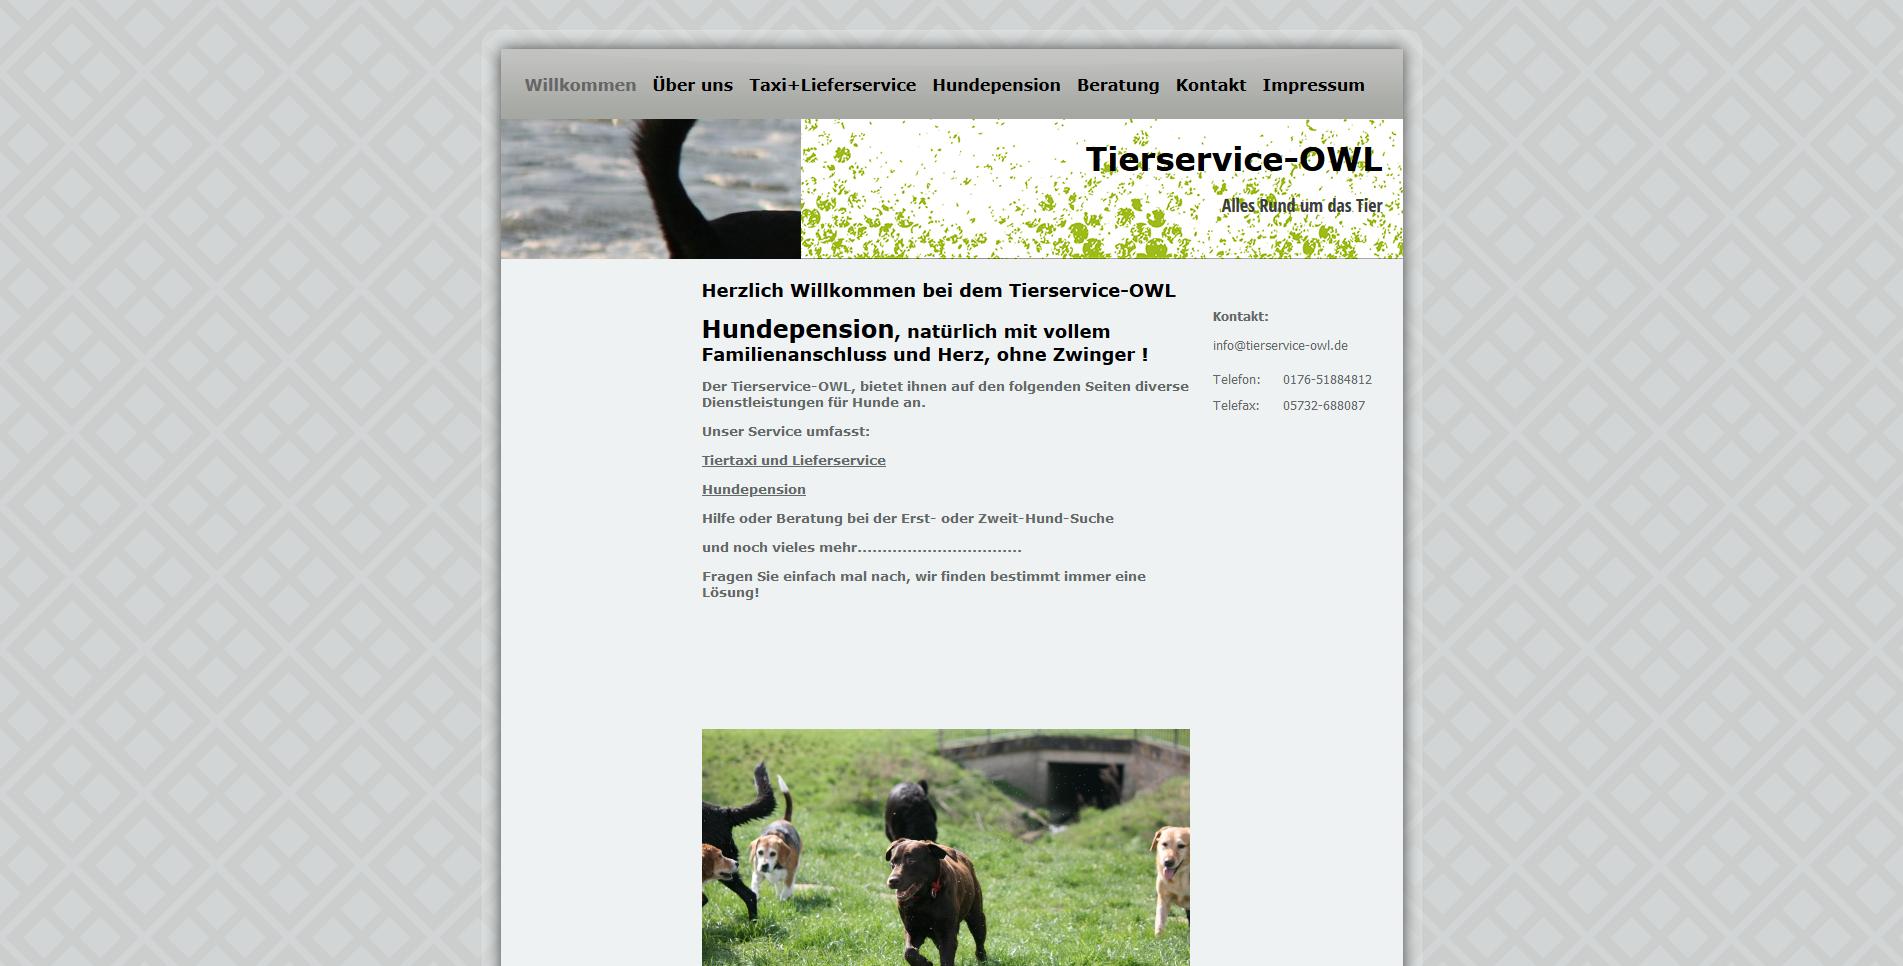 Tierservice-OWL